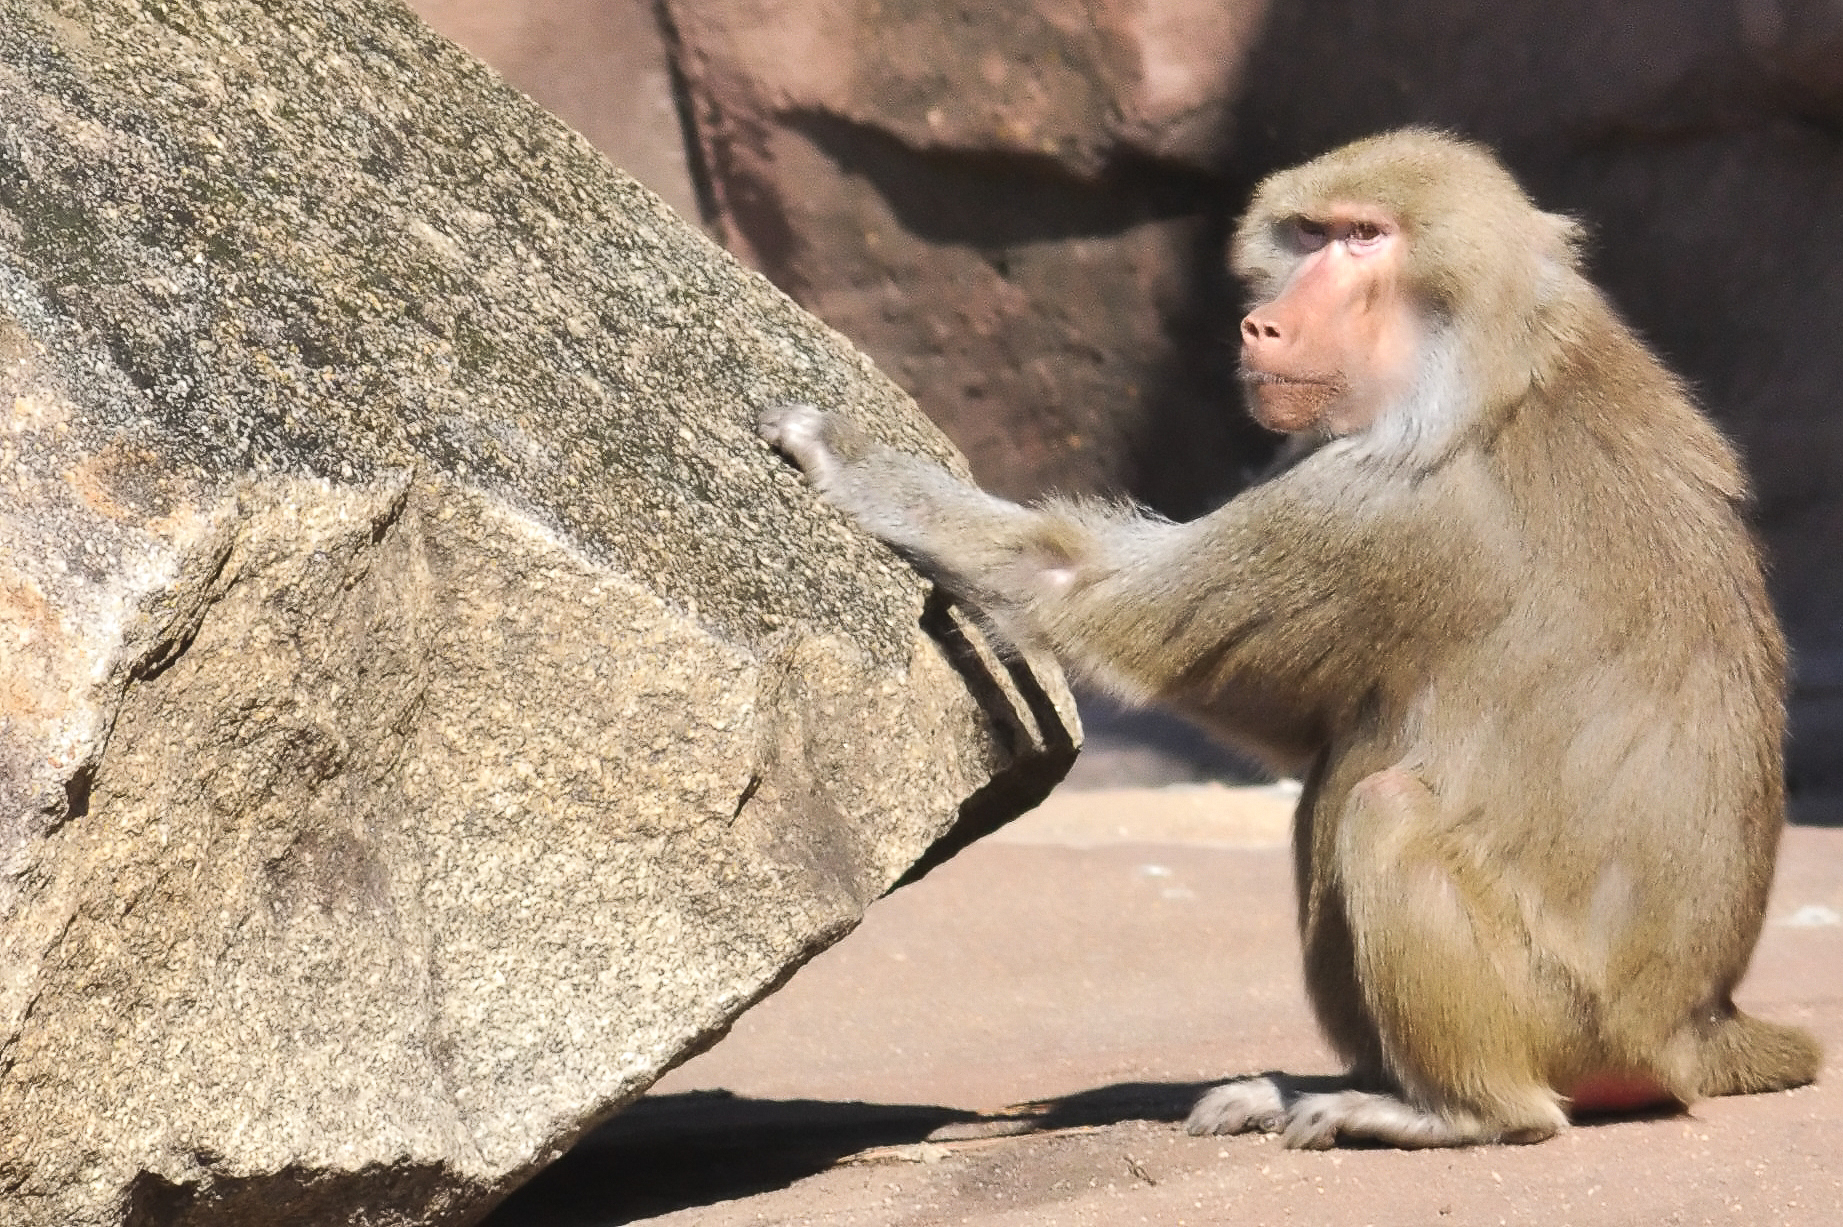 Monkey percussion, Animal, Ape, Chimp, Drummer, HQ Photo